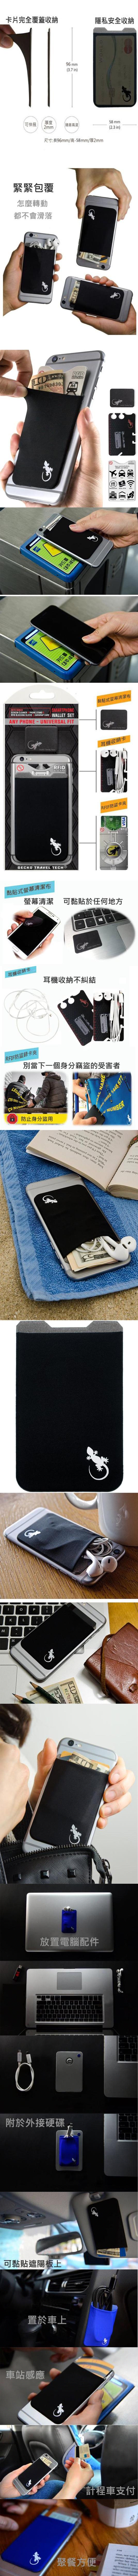 Gecko Travel Tech|防盜卡夾手機貼5件組-黑色(白壁虎)